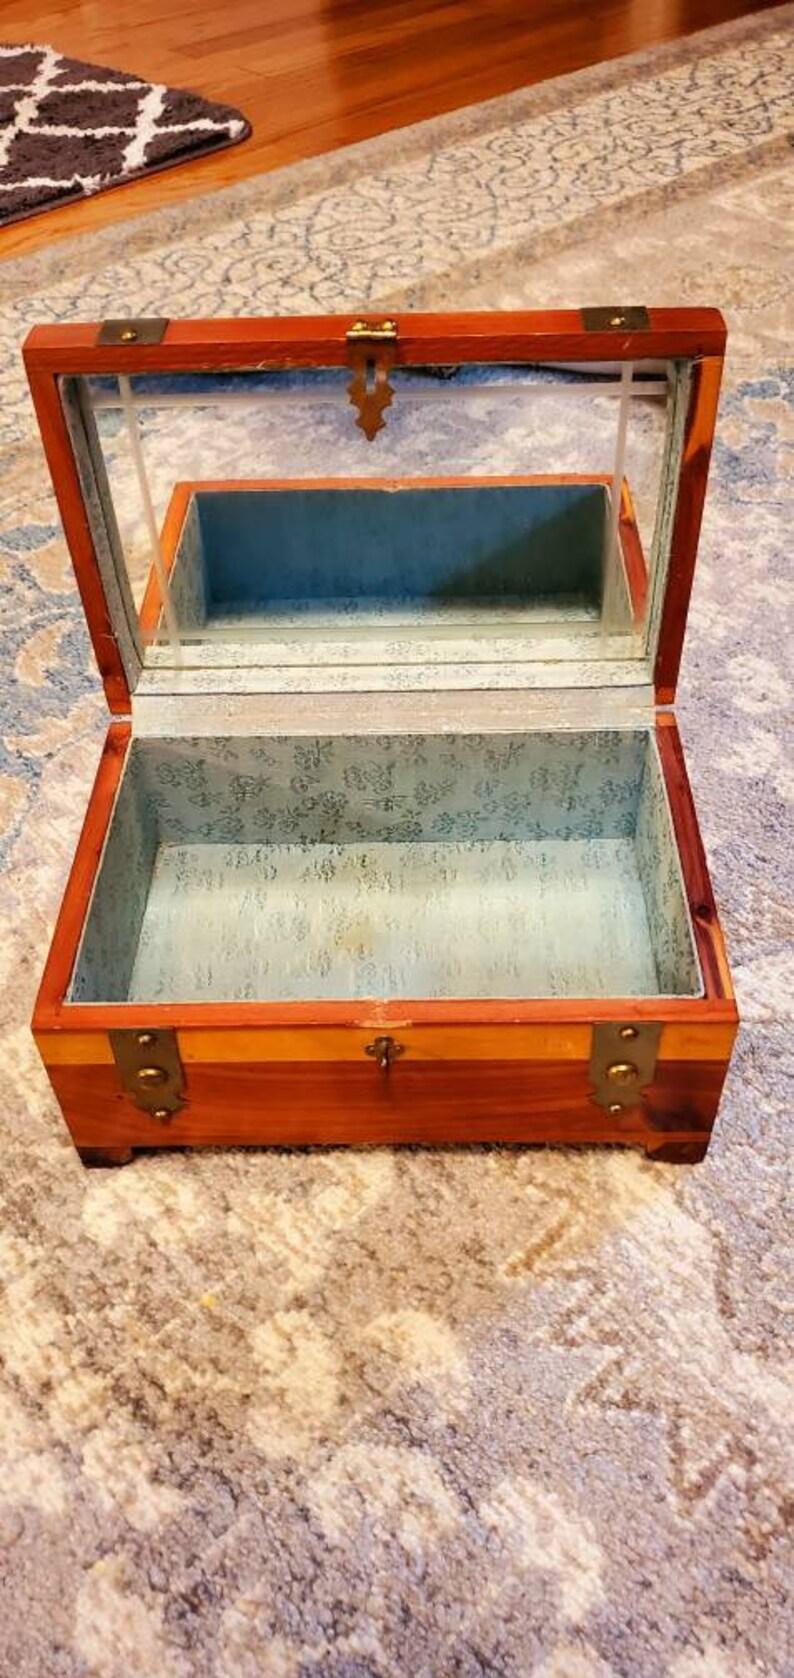 Pilliod Art Box Cedar Jewelry Box with Mirrored Hinged Lid Treasure Box